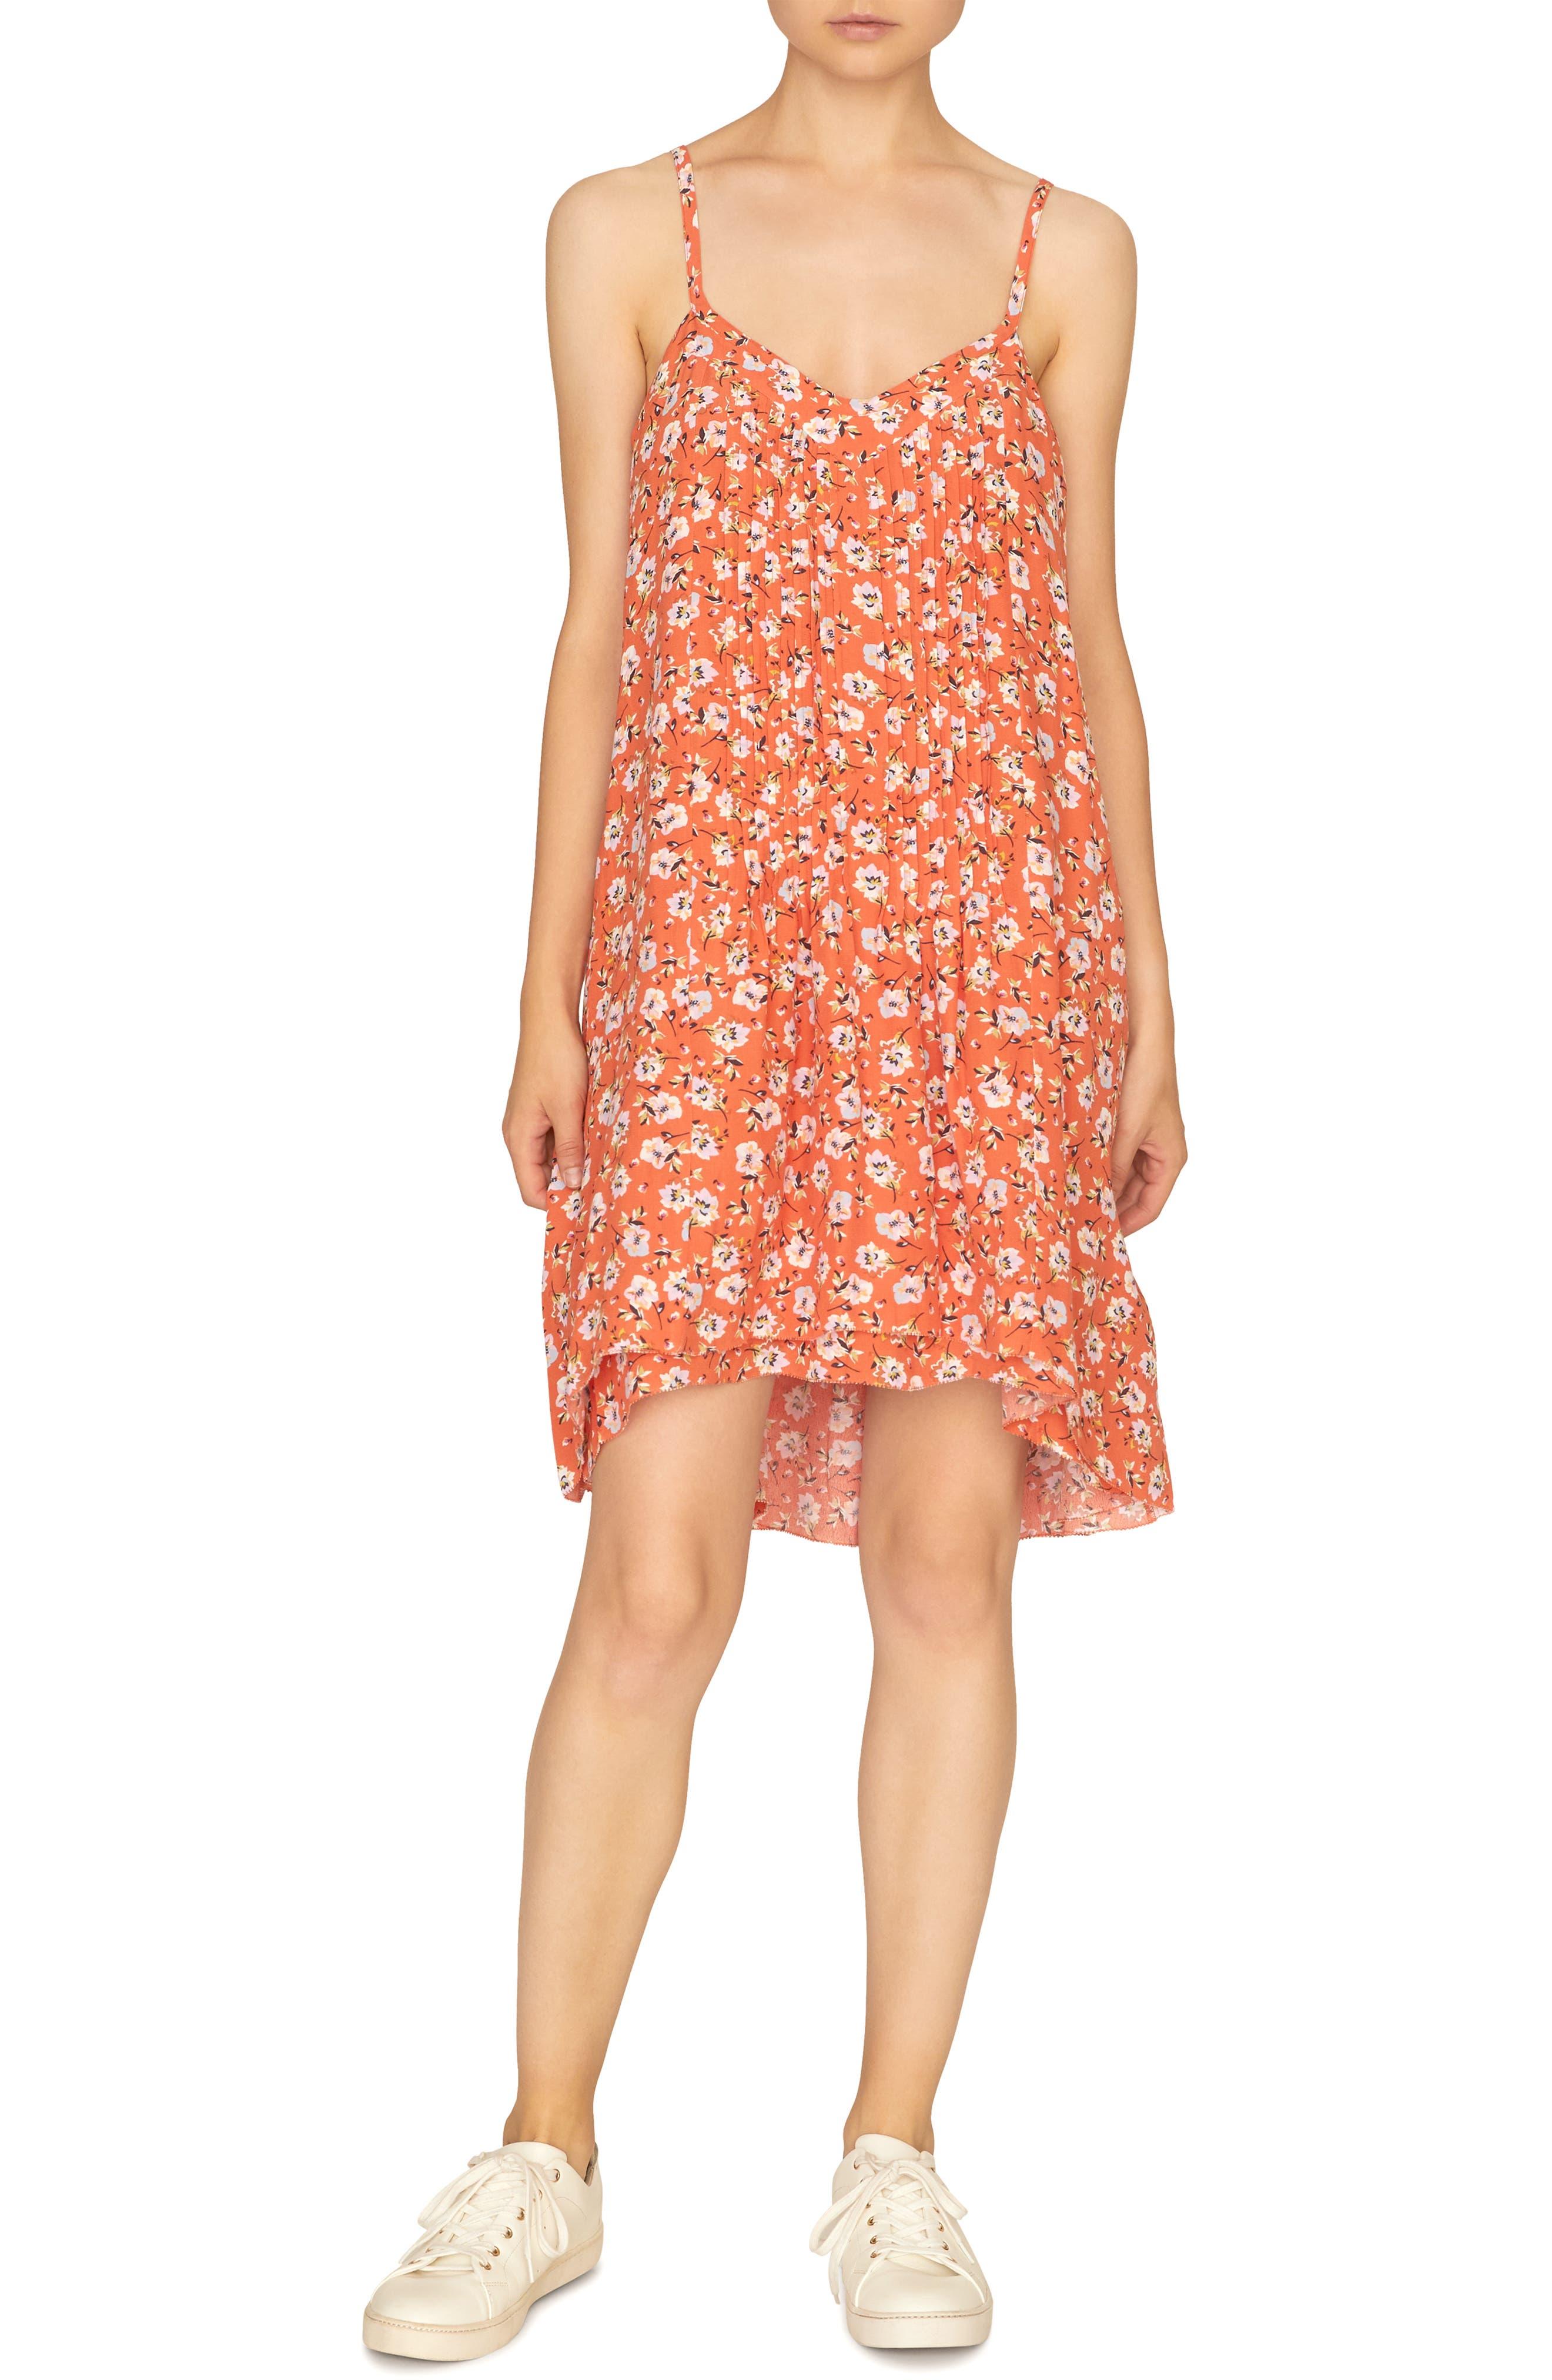 Petite Sanctuary Spring Ahead Tank Dress, Orange